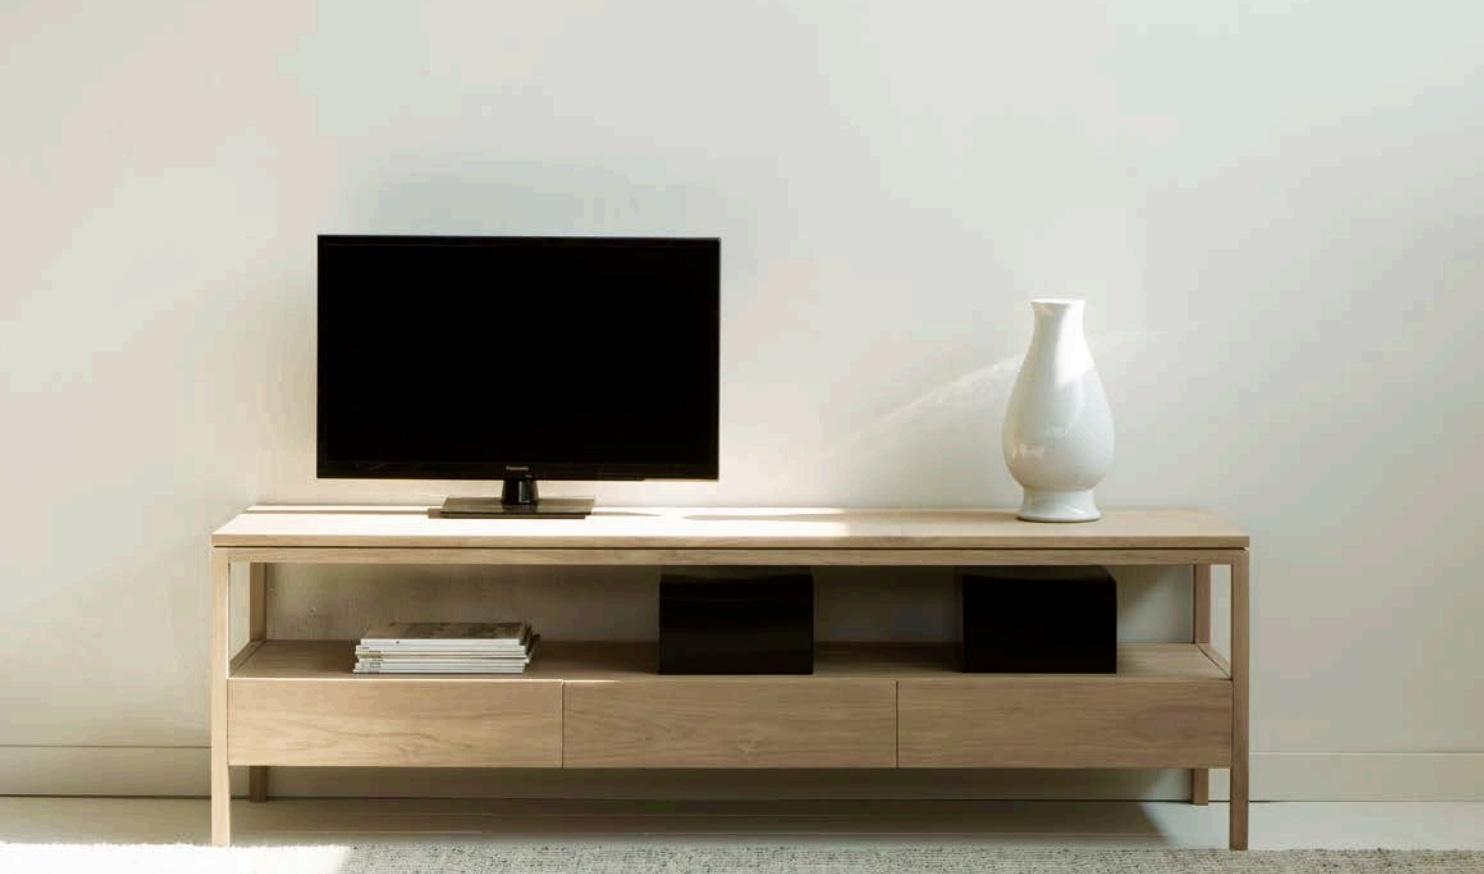 Mia Home Tienda De Muebles Mesa Moderna Para Television De Teca - Mesas-para-tv-modernas